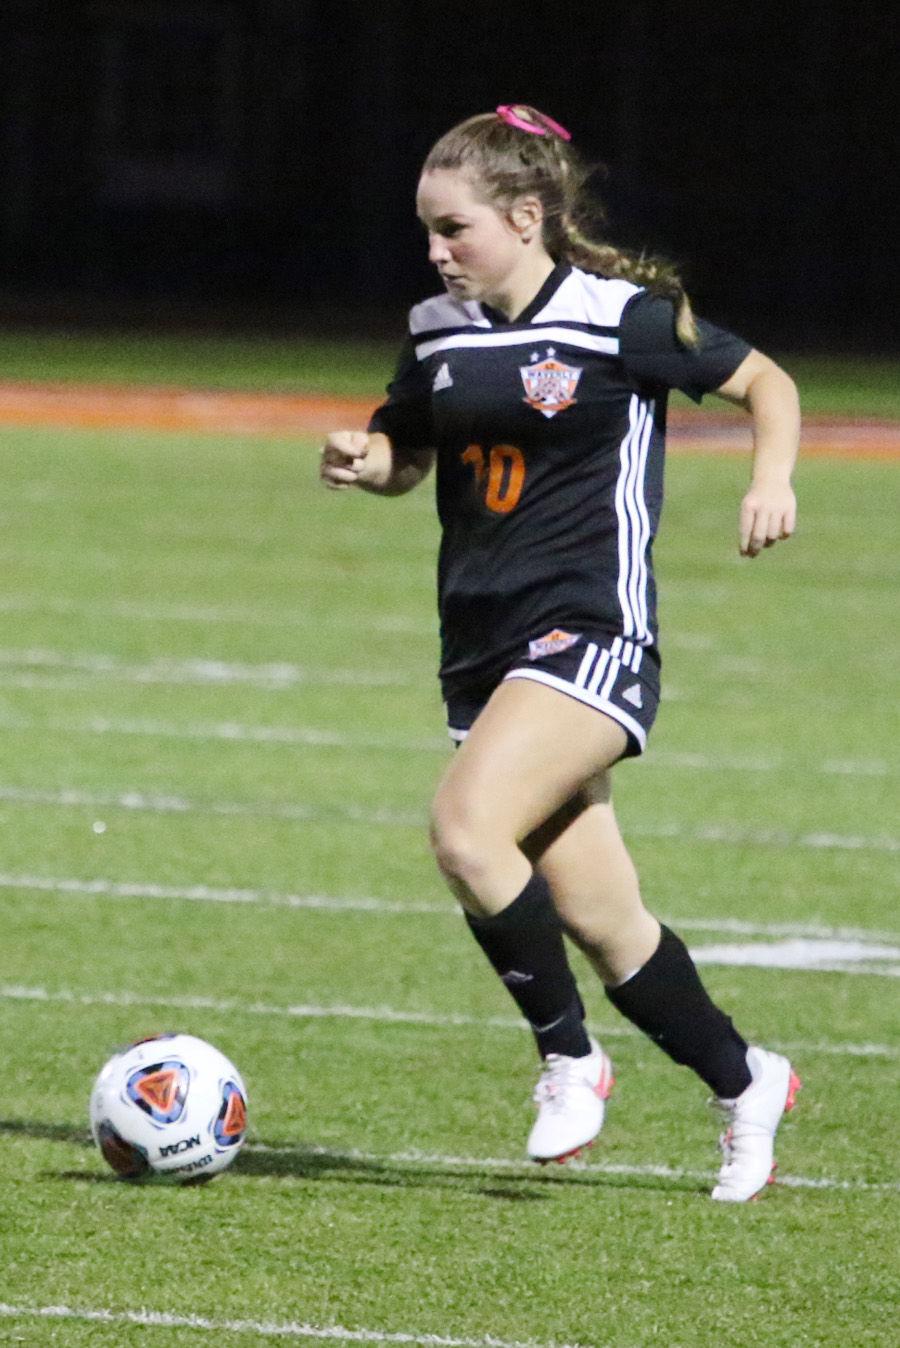 Amelia Willis push ball up field